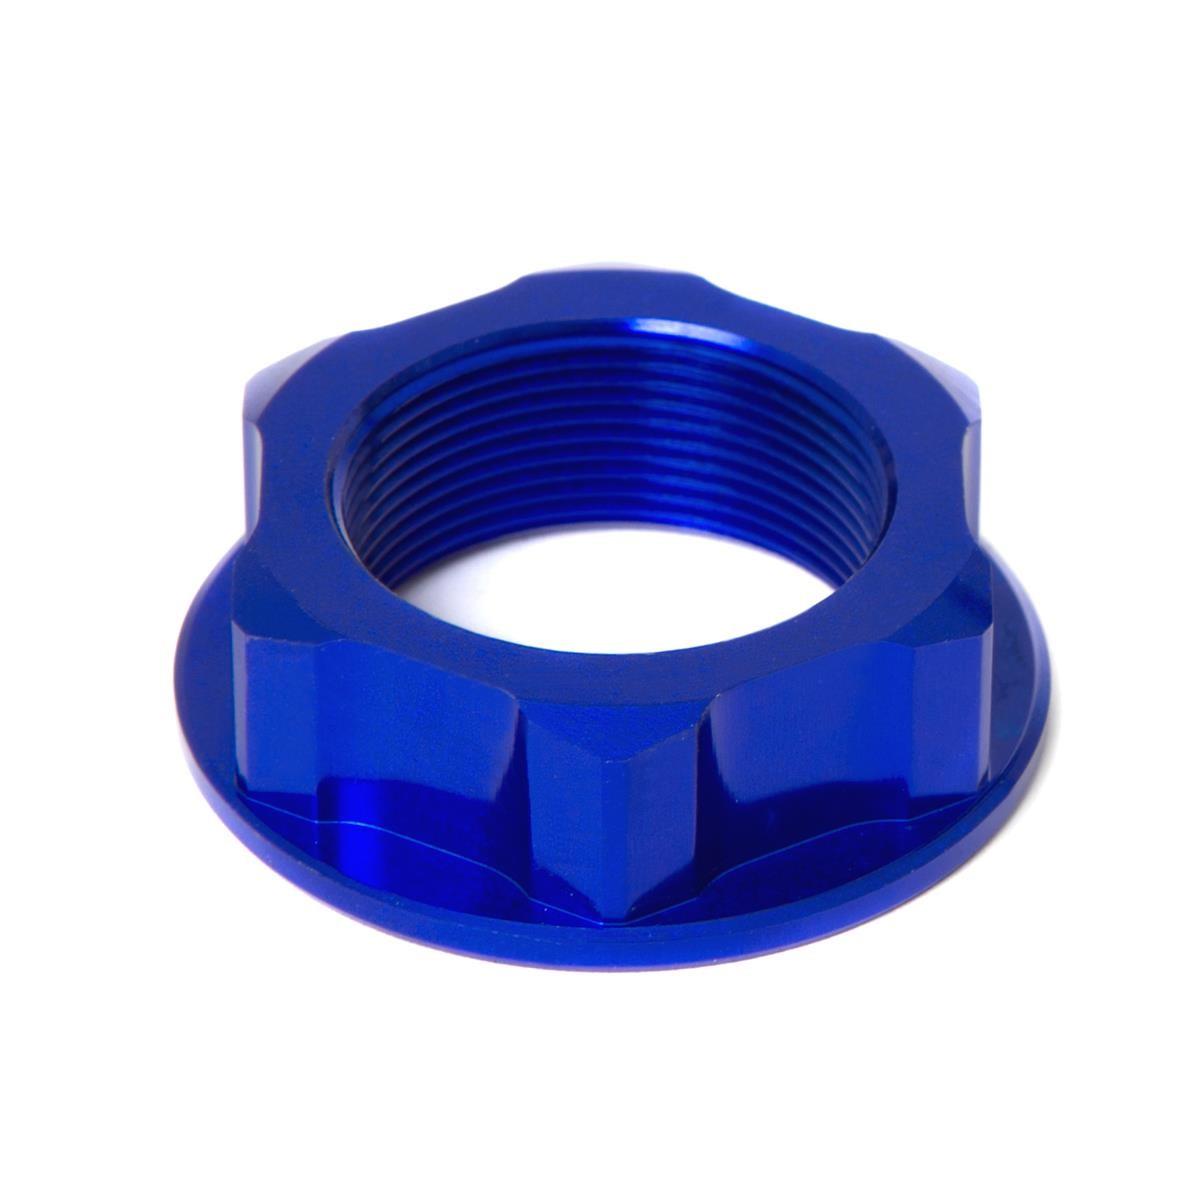 Zeta Steering Stem Nut Blue Kawasaki Kx 125250 Kxf 250450